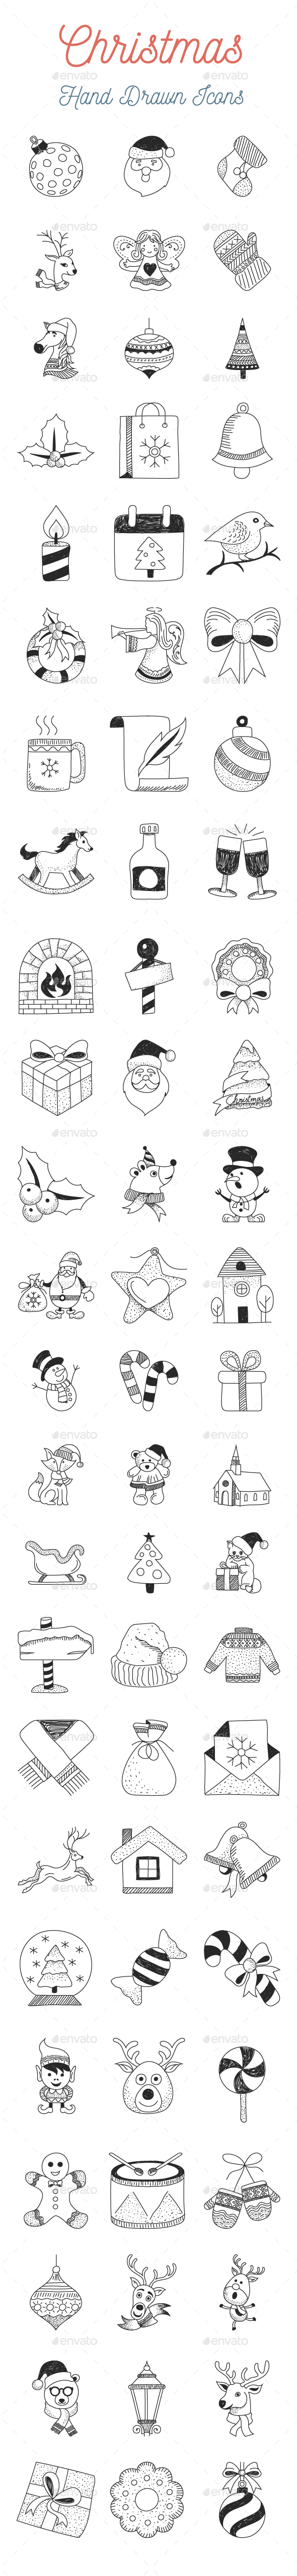 Christmas Hand Drawn Icons - Icons